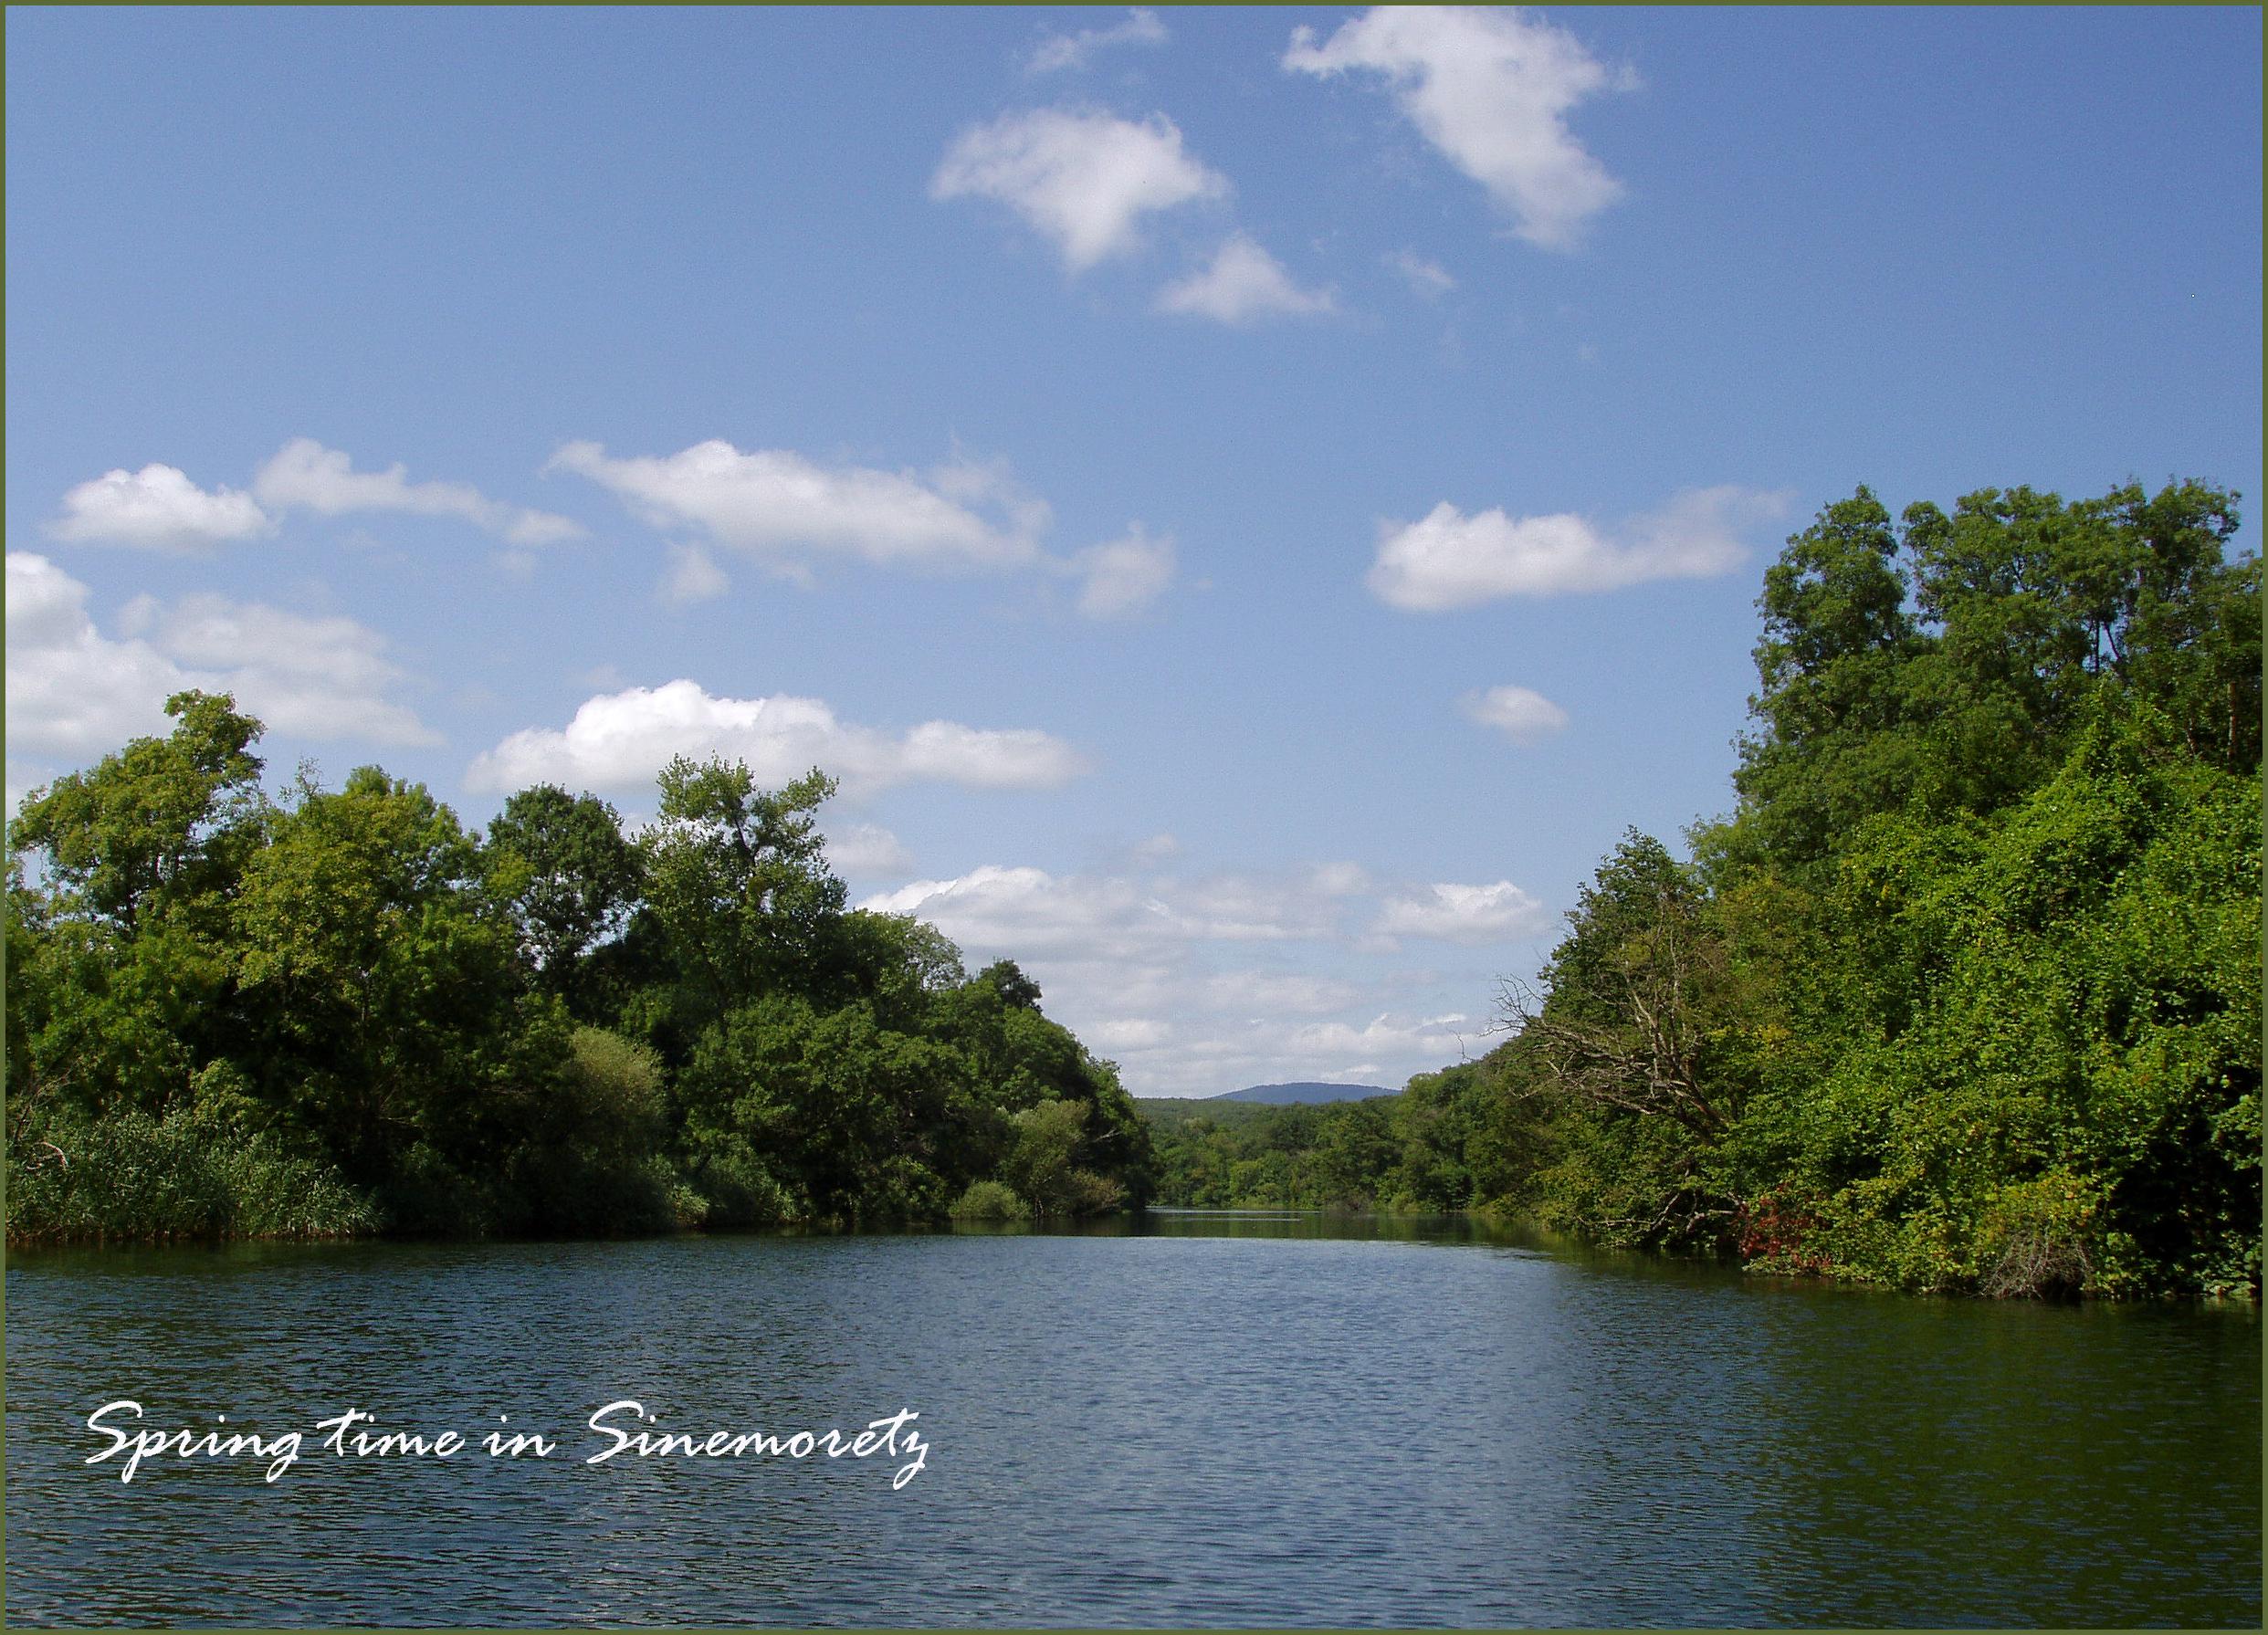 Strandza Nature Park